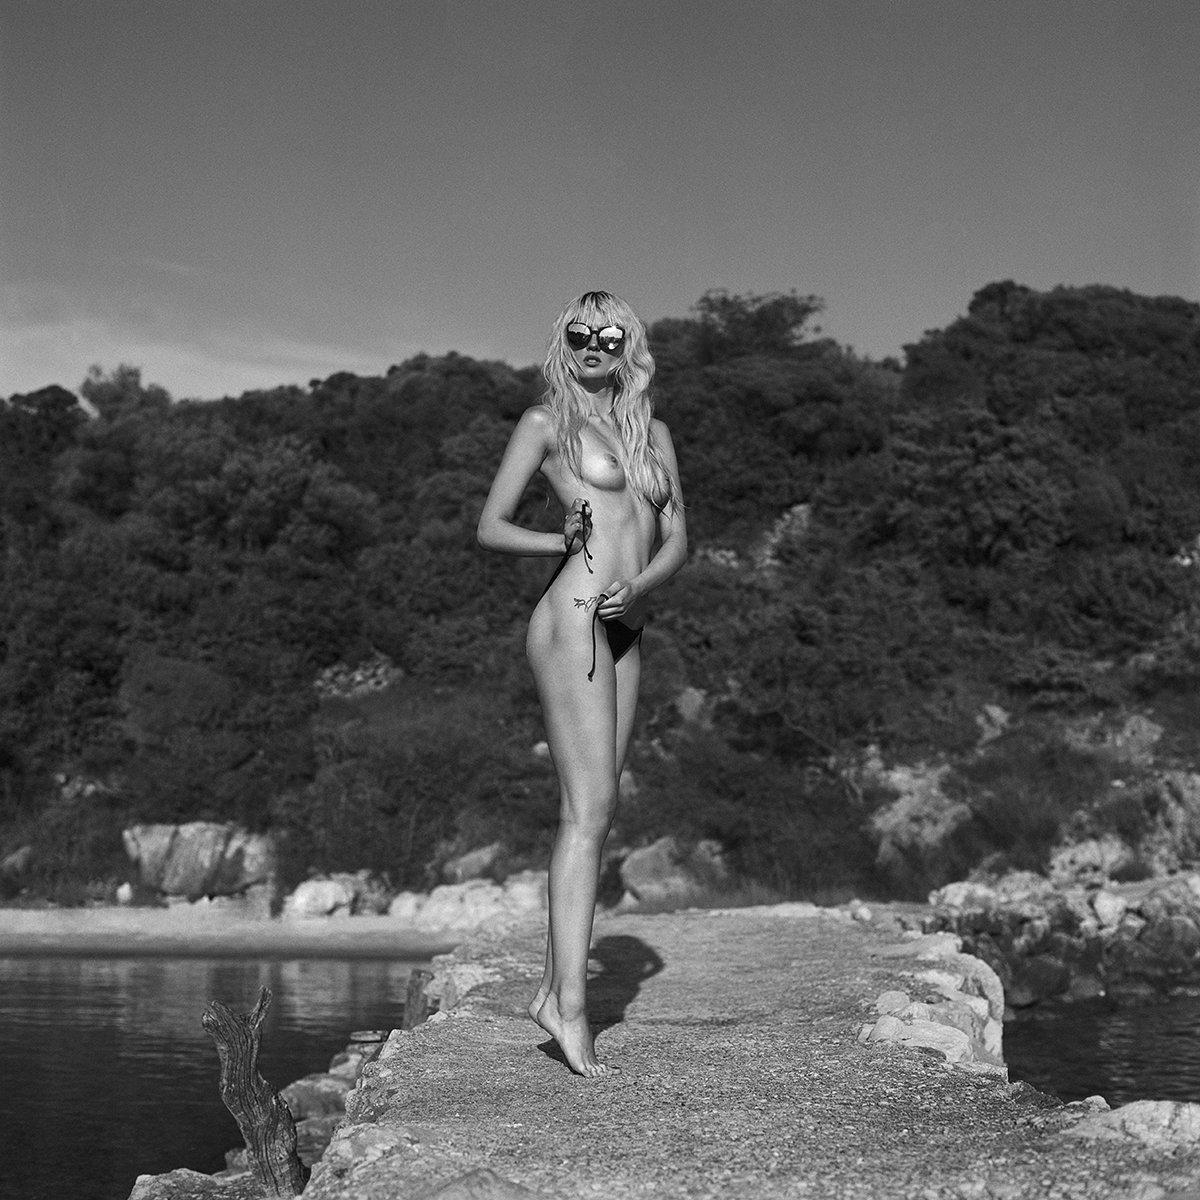 akt, nude, analog, women, topless, fineart, hasselblad, bw, 6x6,, NinoVeron